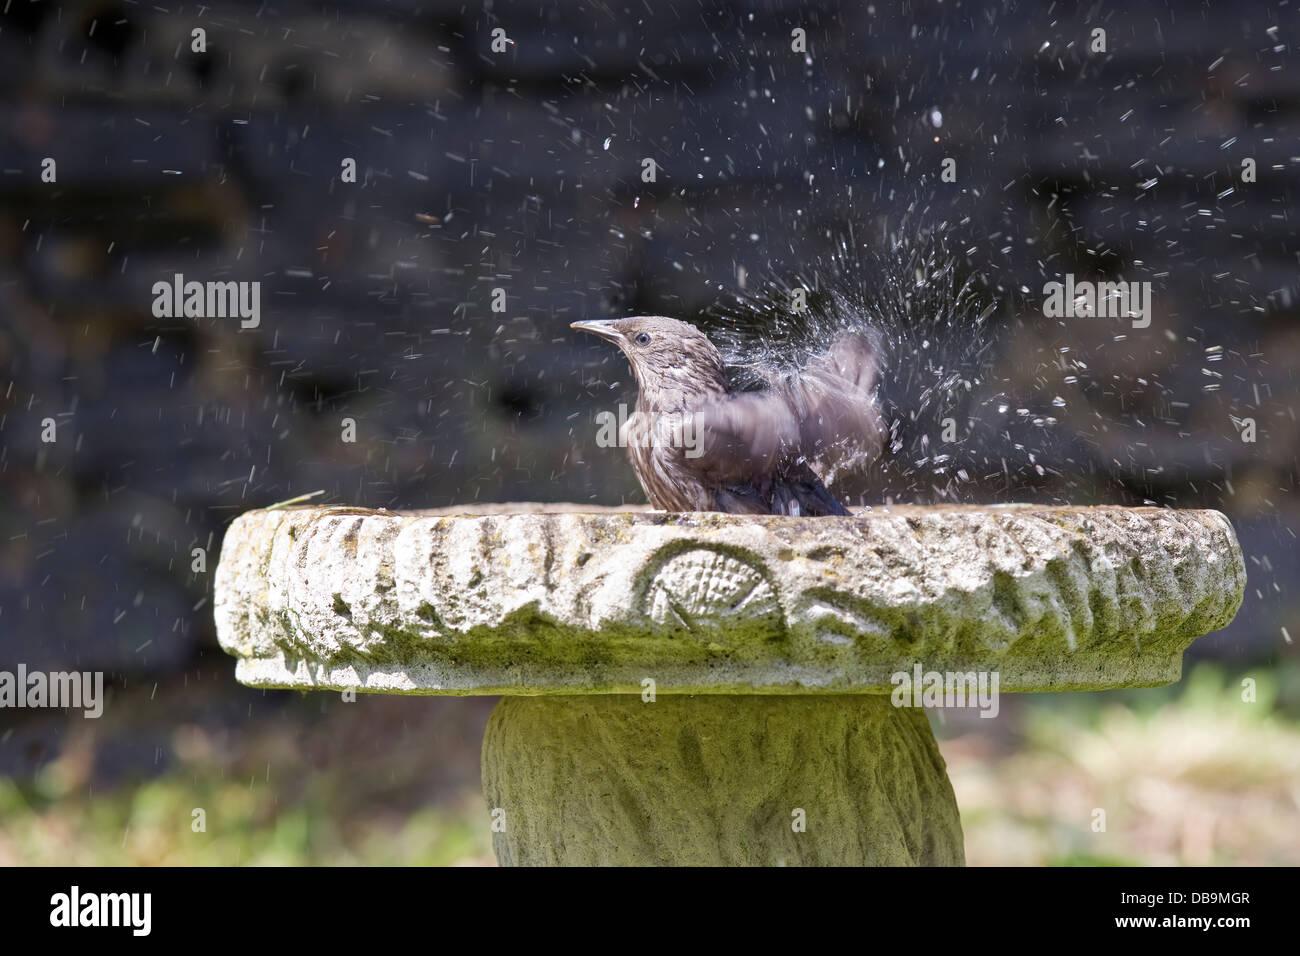 Juvenile Starling Sturnus Vulgaris bathing in a bird bath in hot weather - Stock Image